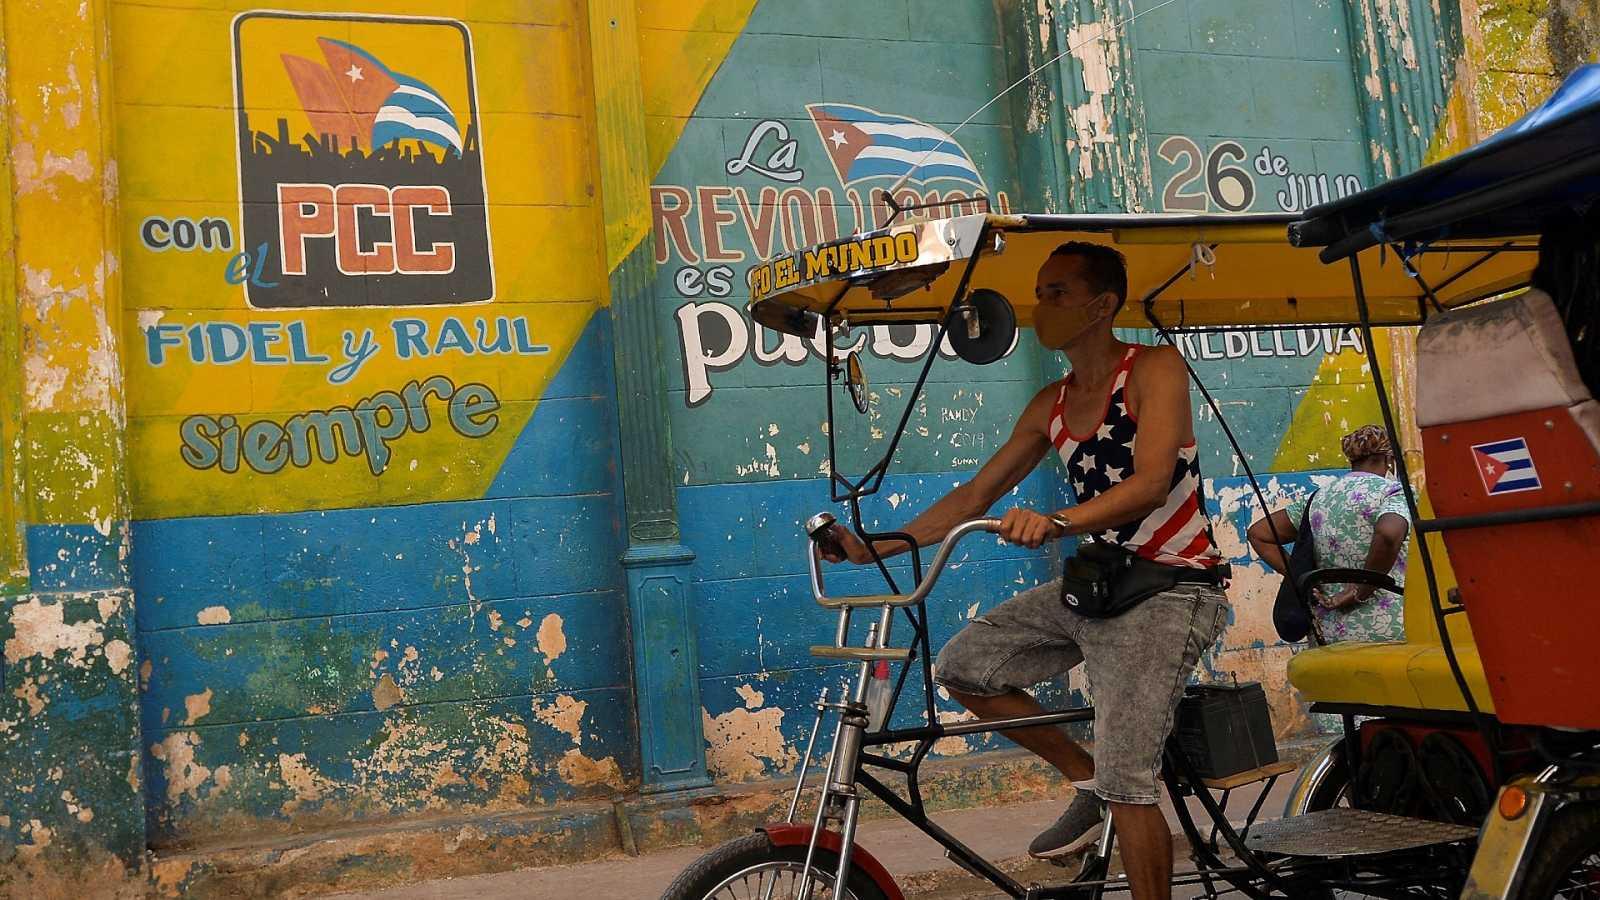 Reportajes 5 Continentes - Raúl Castro, a punto de ceder el liderazgo del PC de Cuba - Escuchar ahora